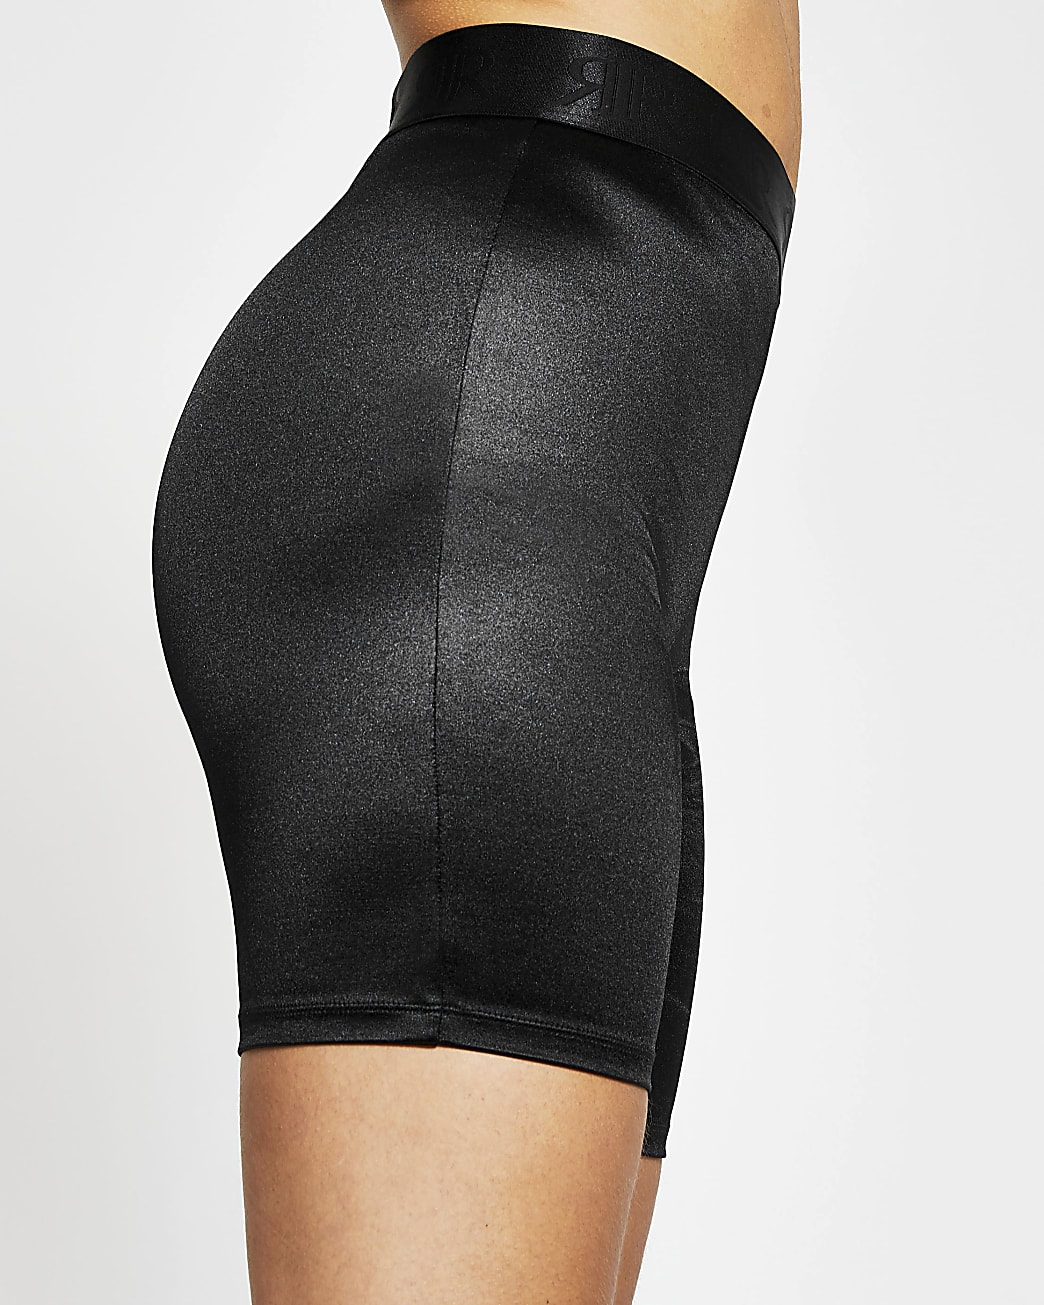 Black satin cycling short